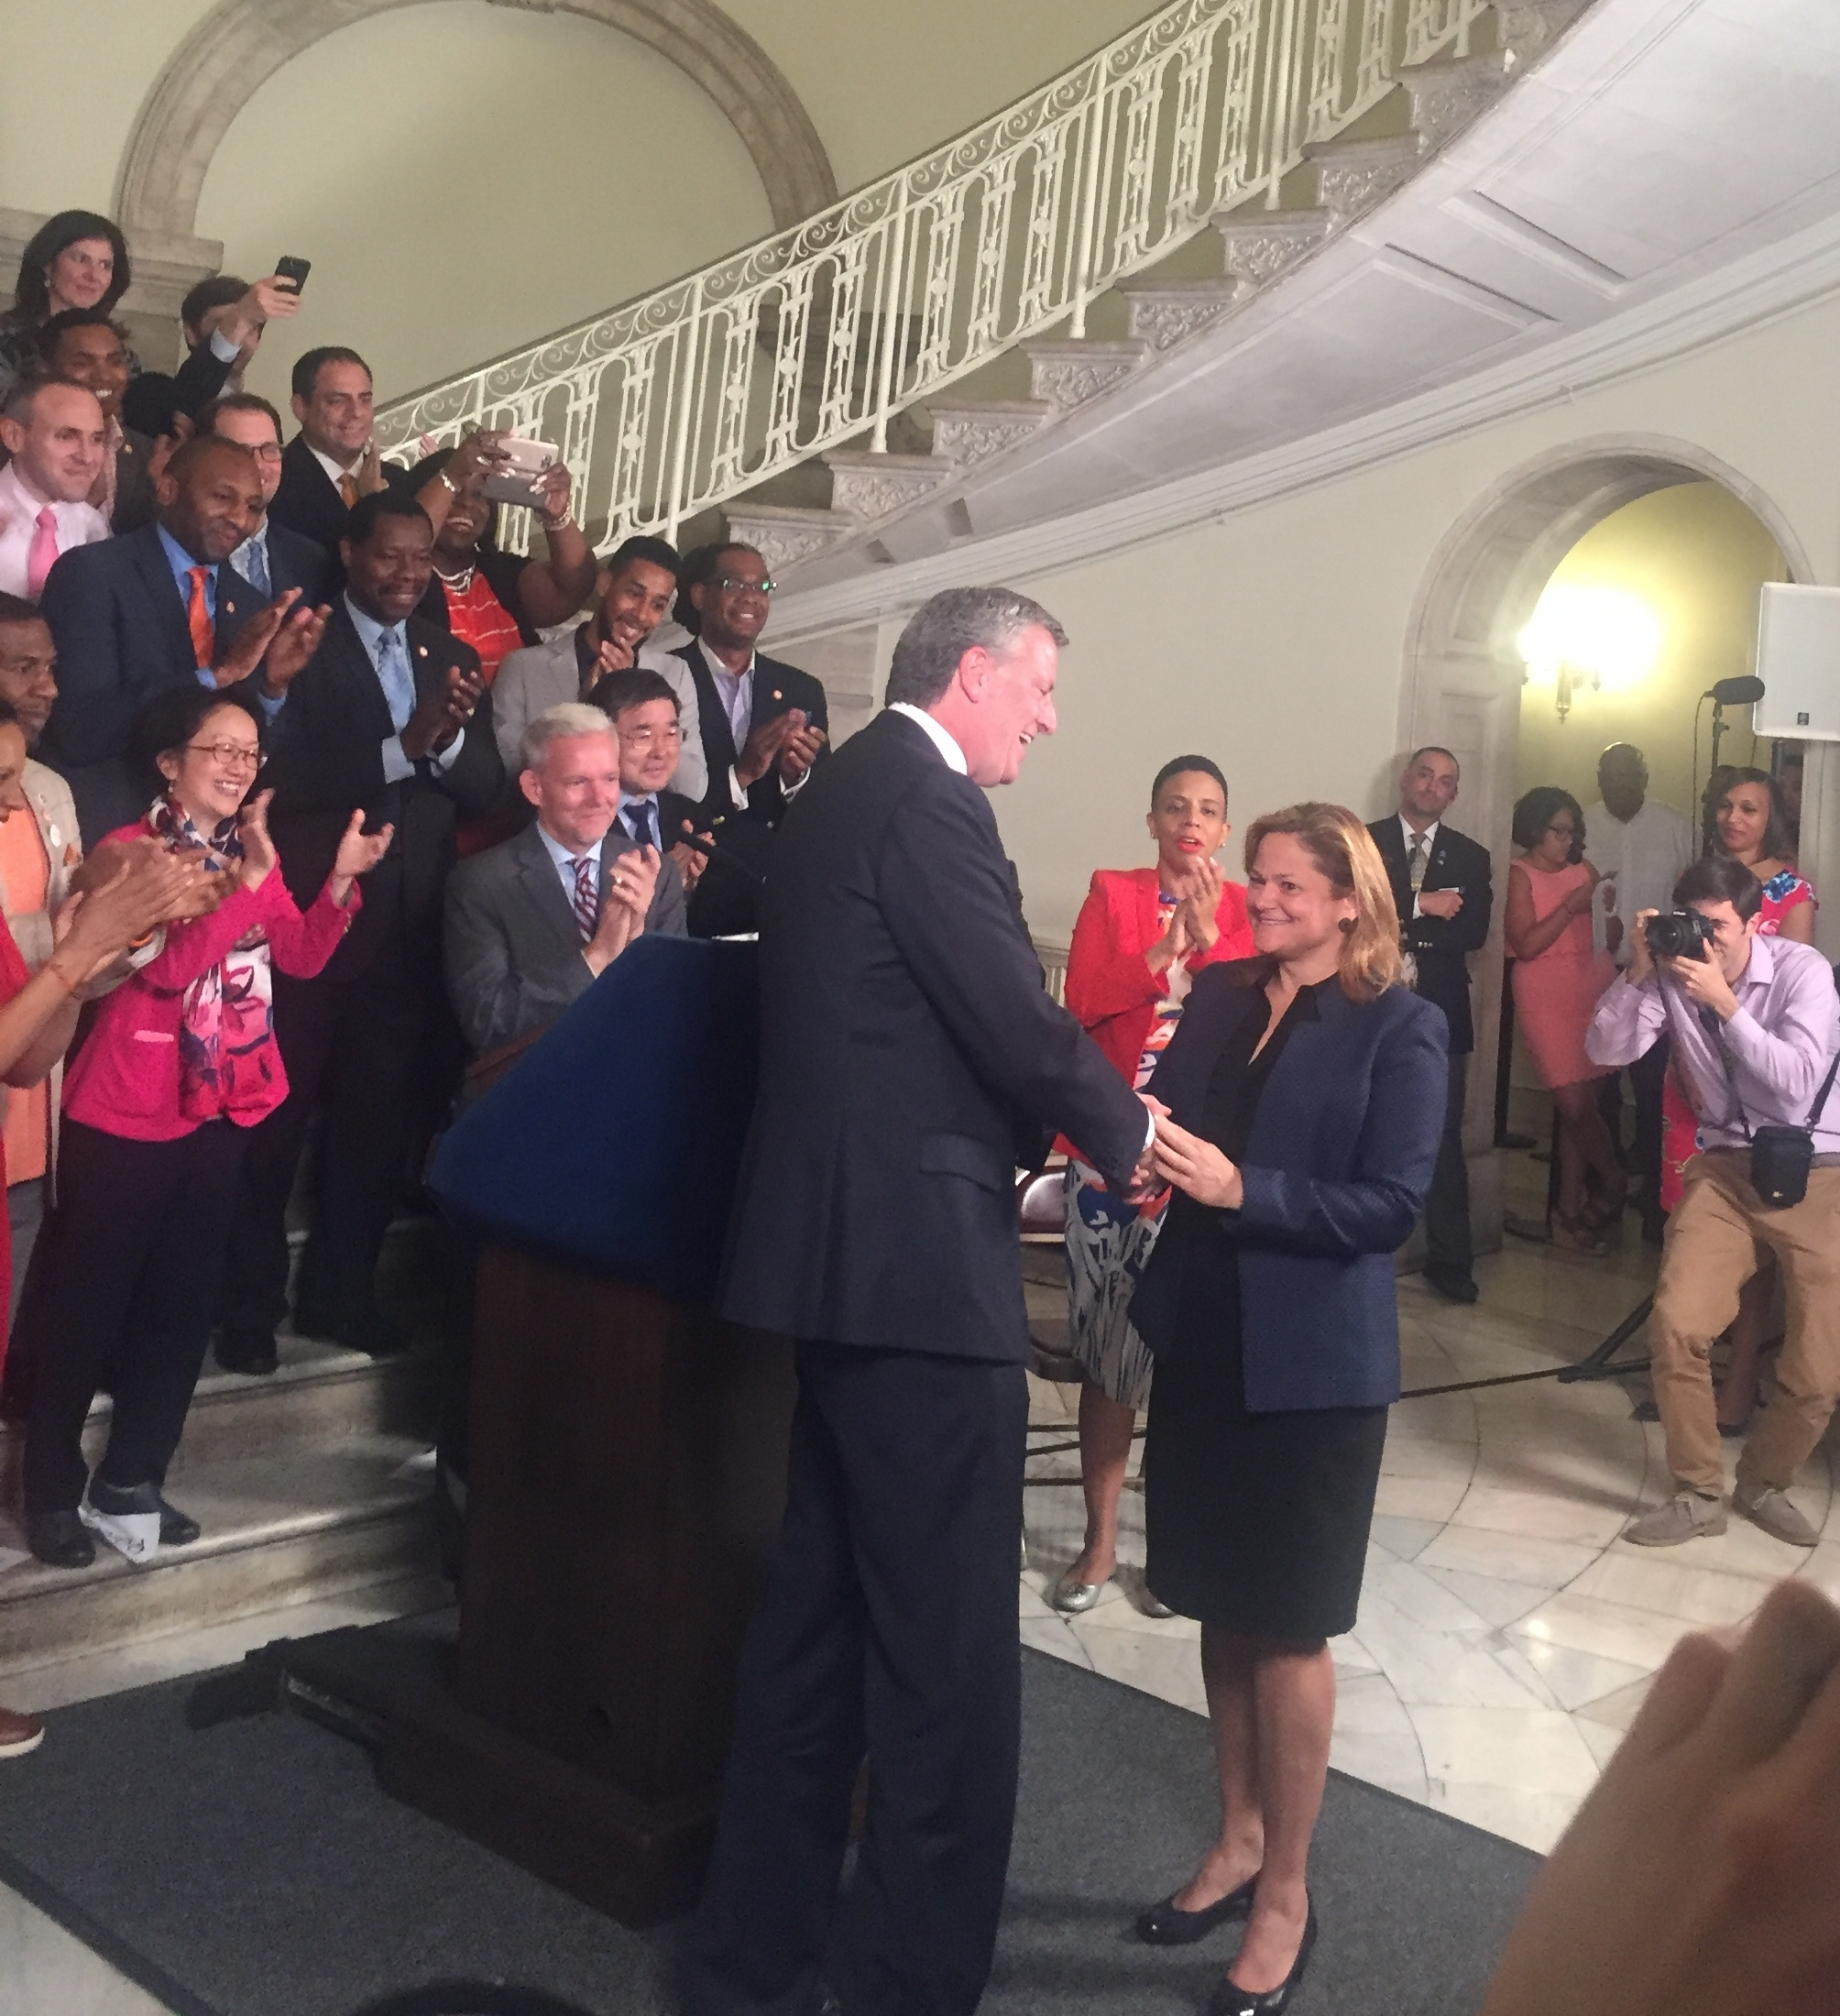 Mayor Bill de Blasio, City Council Speaker Melissa Mark-Viverito and City Council Members at budget handshake Press Conference on June 2, 2017.